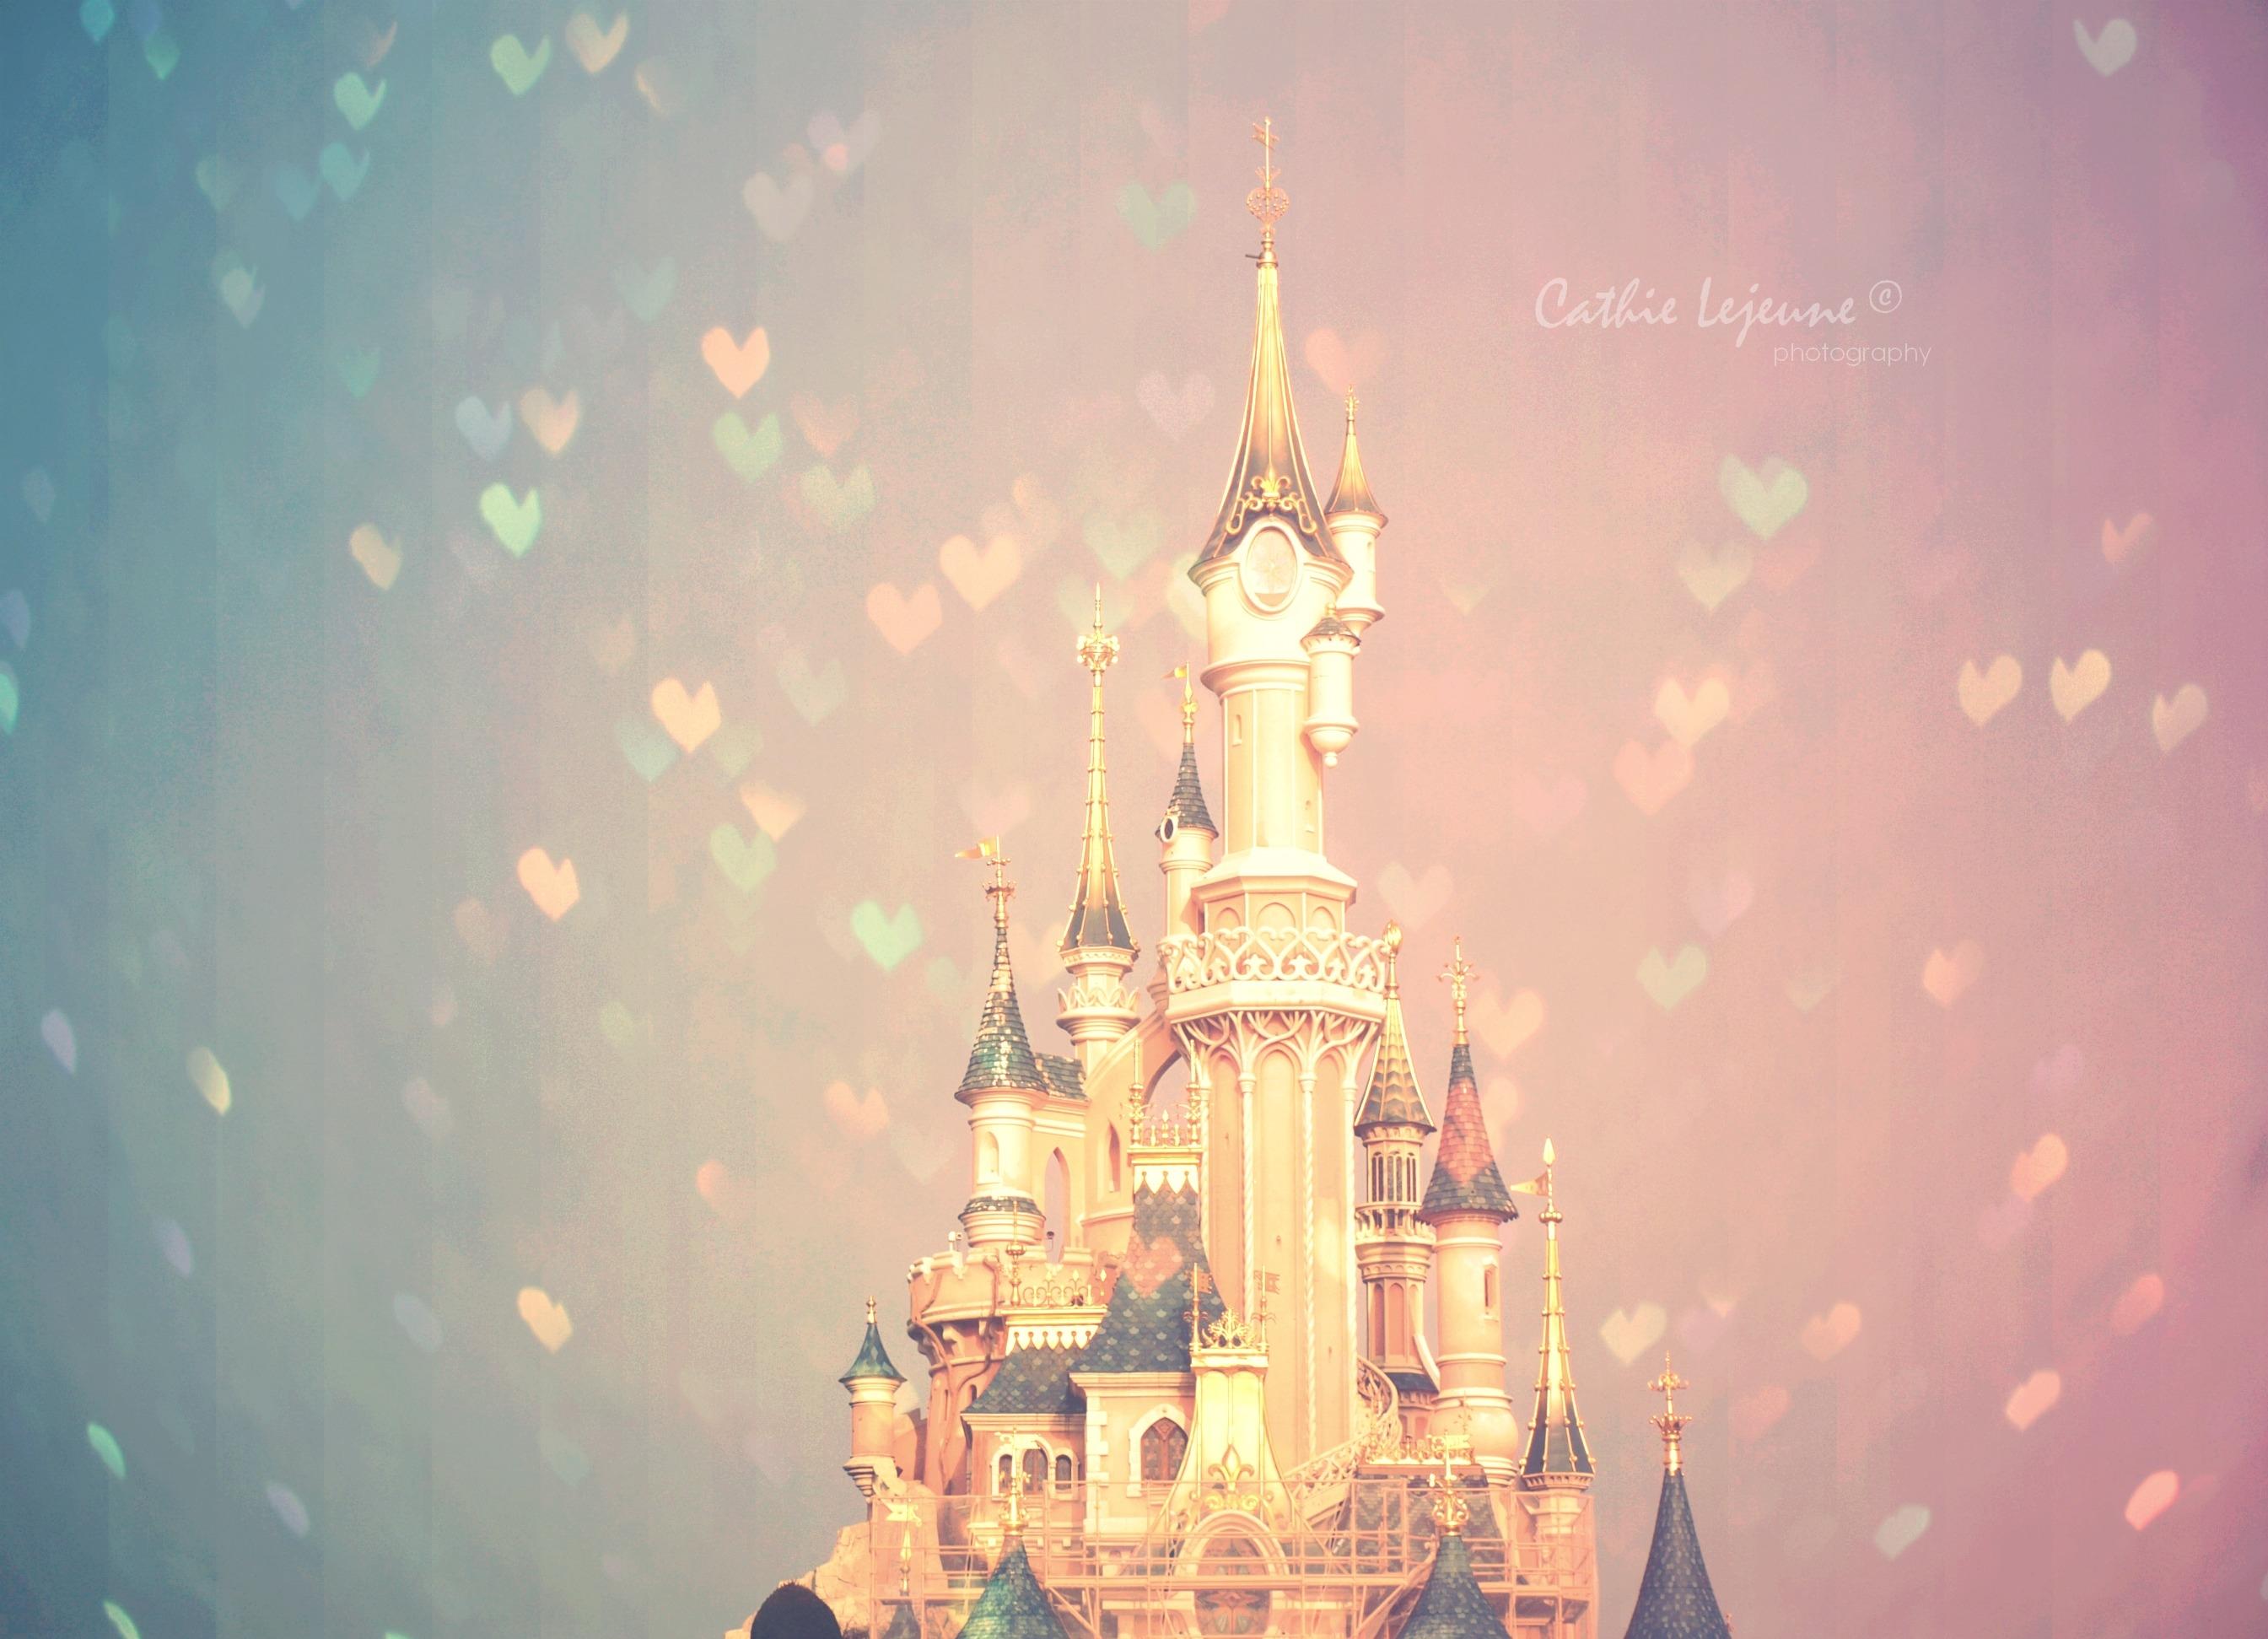 Sleeping Beauty Castle by Retaediamrem 2689x1943